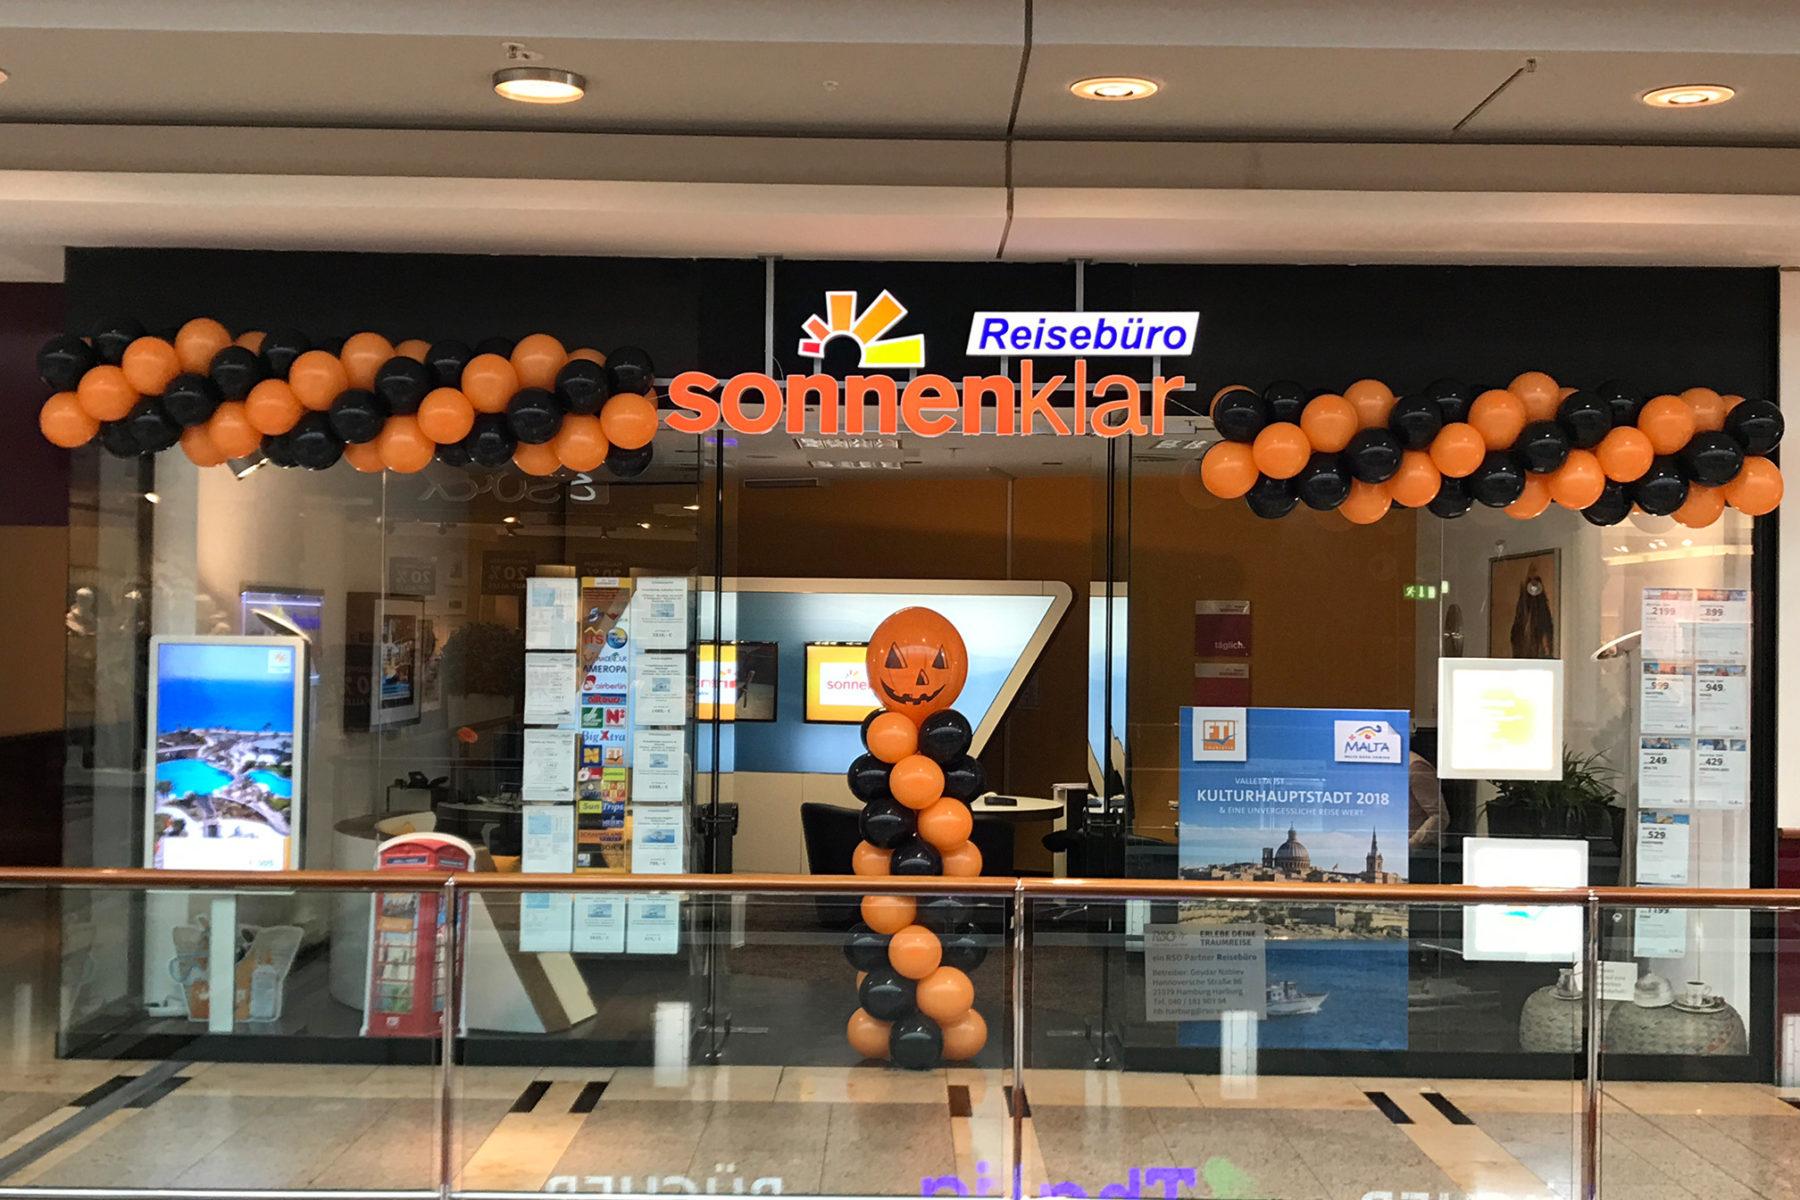 Event-Balloons Reisebüro Sonnenklar Luftballongirlande Zweifarbig Orange schwarz